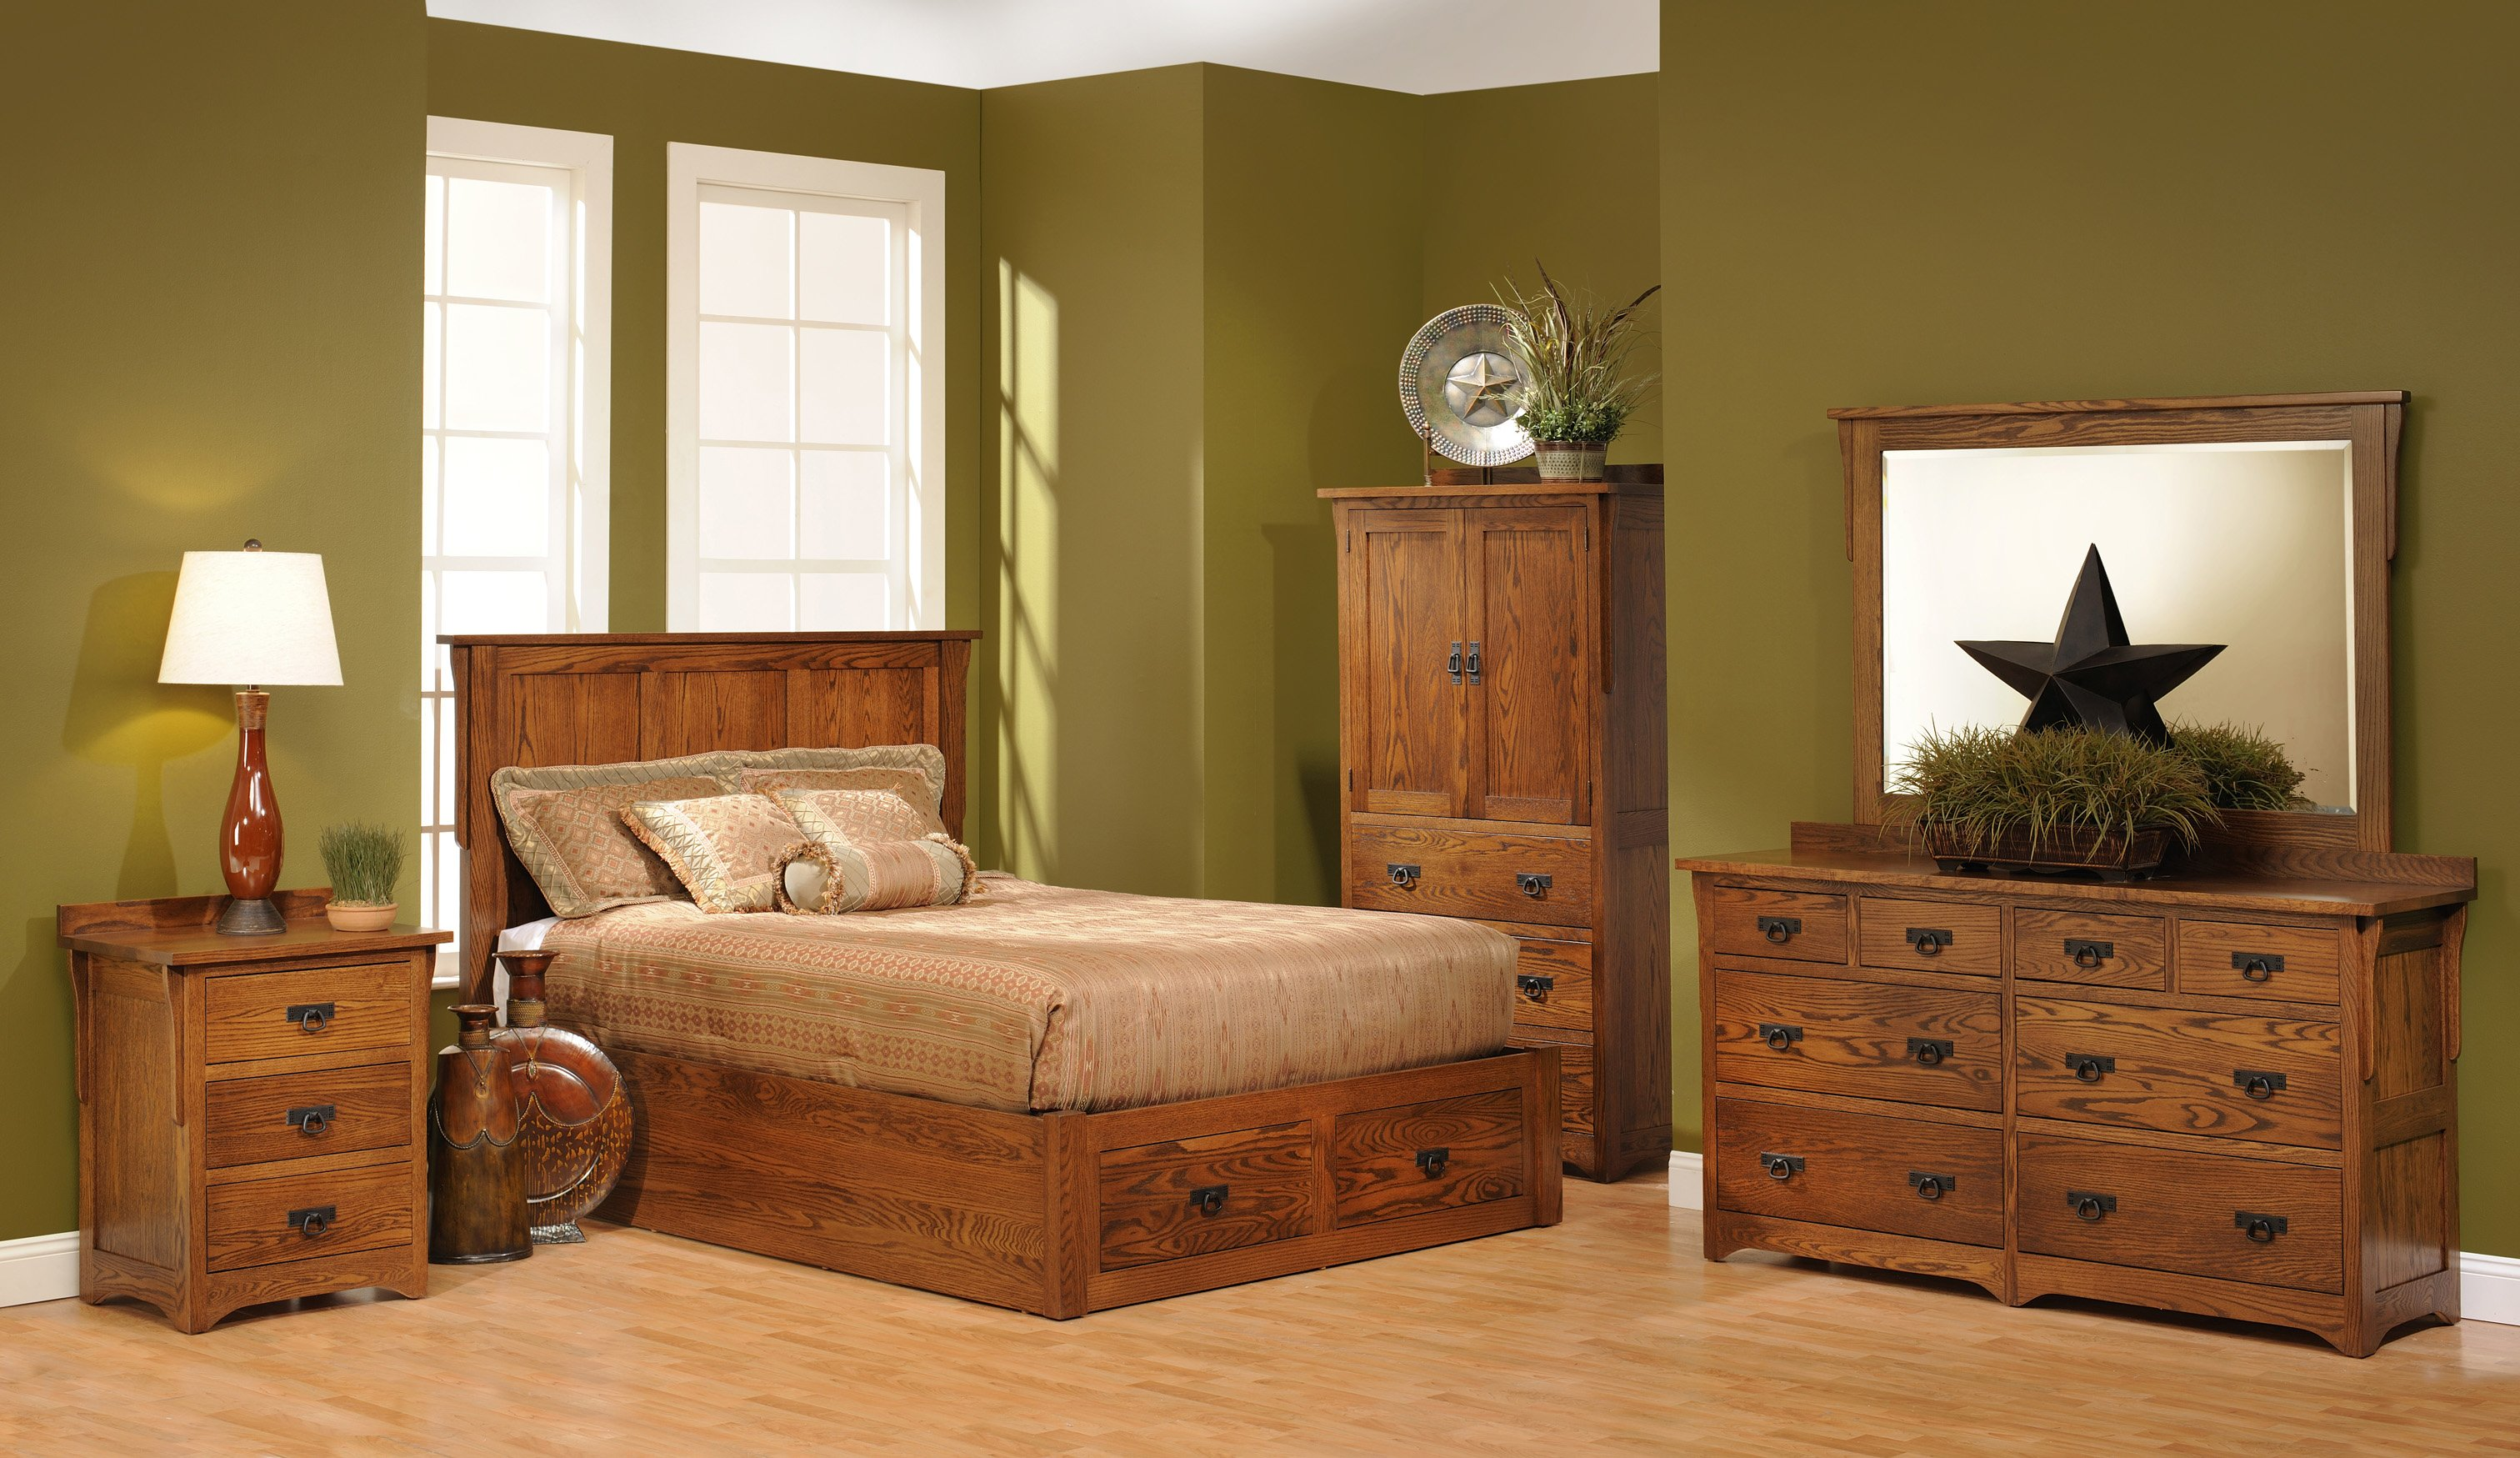 Mission Slat Bedroom Furniture Rochester Ny Jack Greco